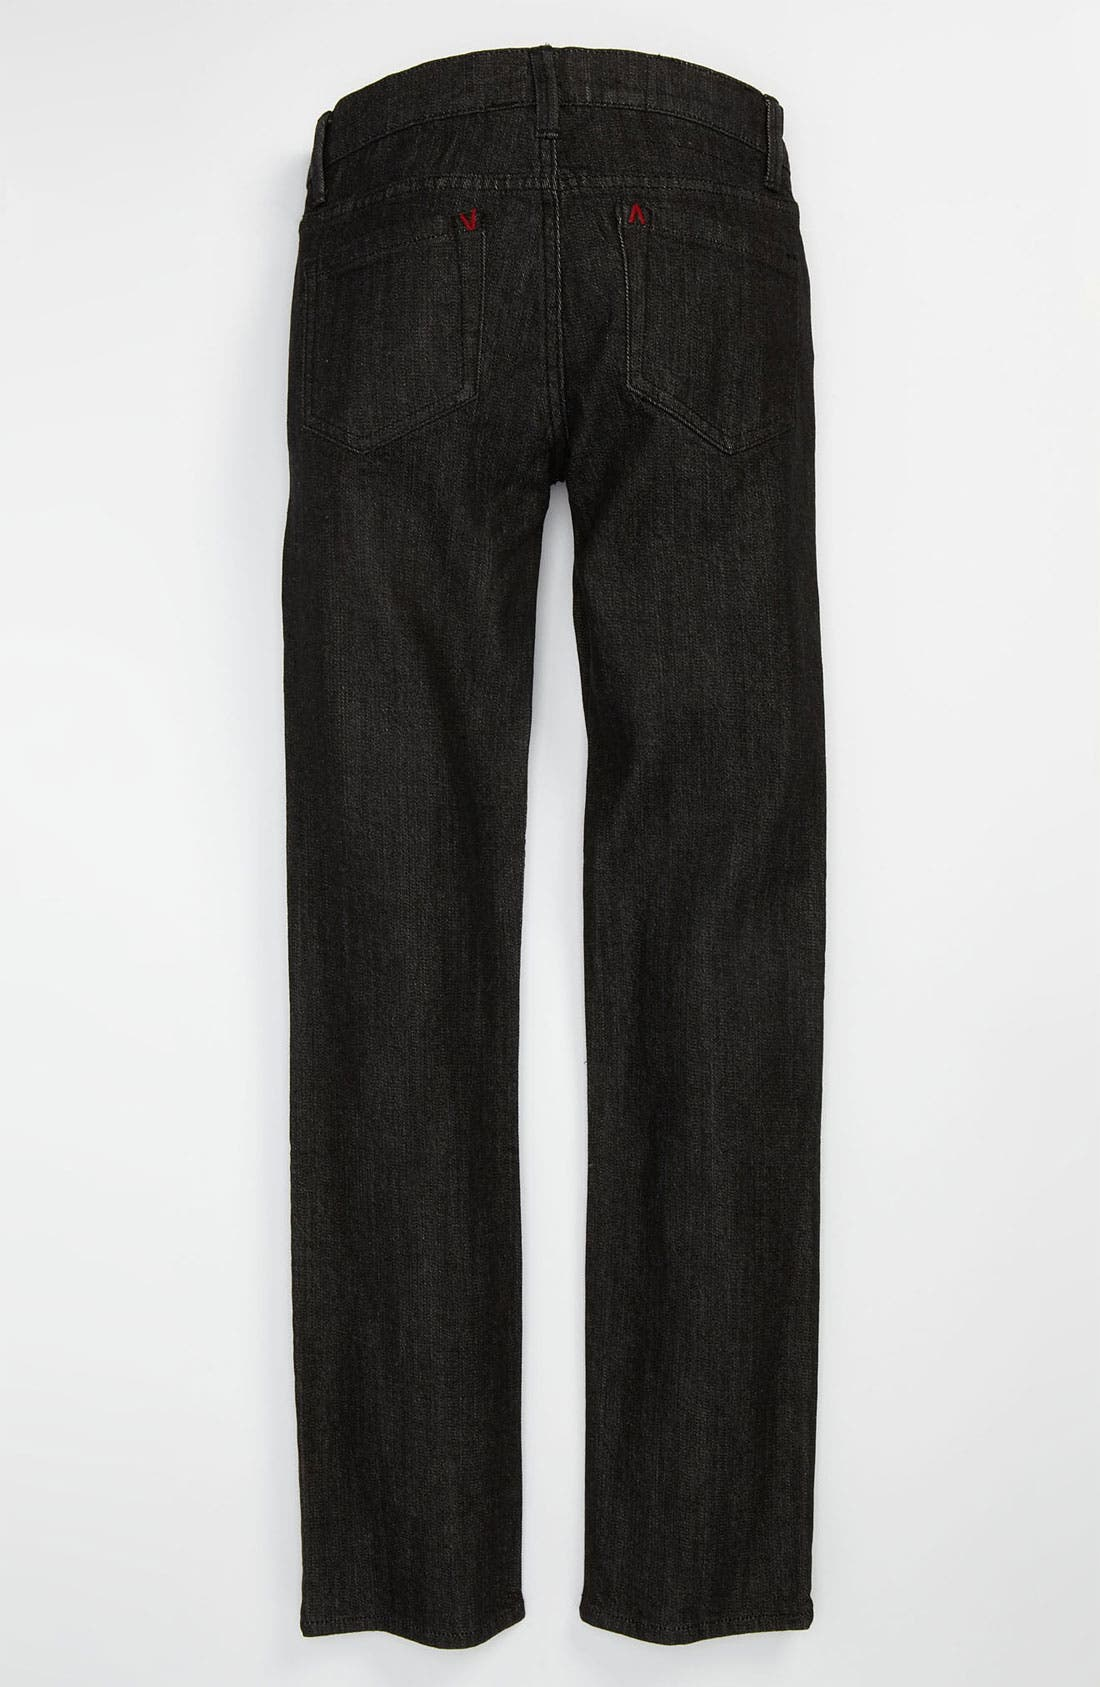 Main Image - RVCA 'Regulars' Slim Fit Jeans (Black) (Big Boys)